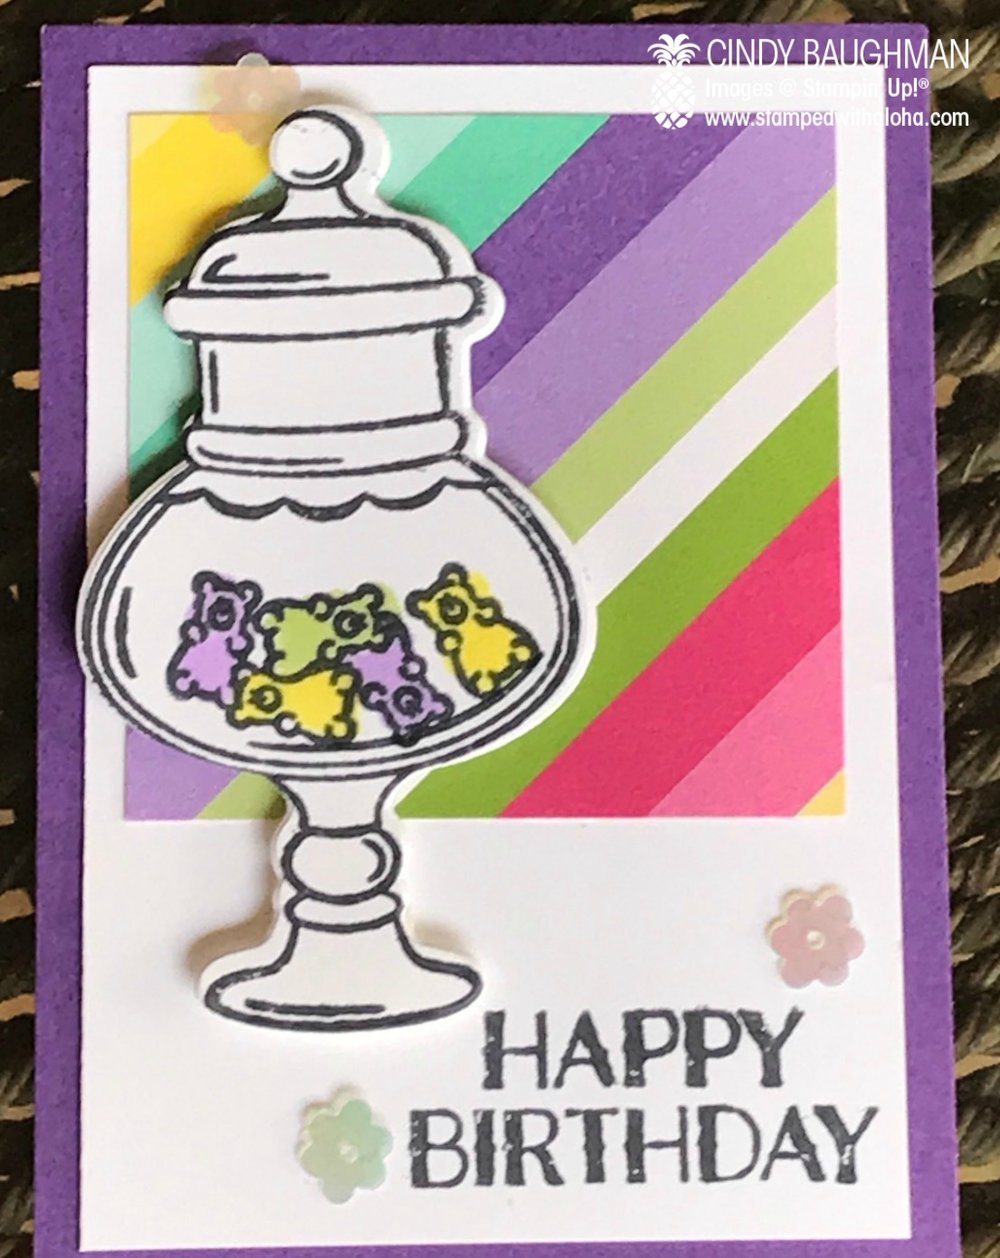 Gummy Bear Card Candy - stampedwithaloha.com